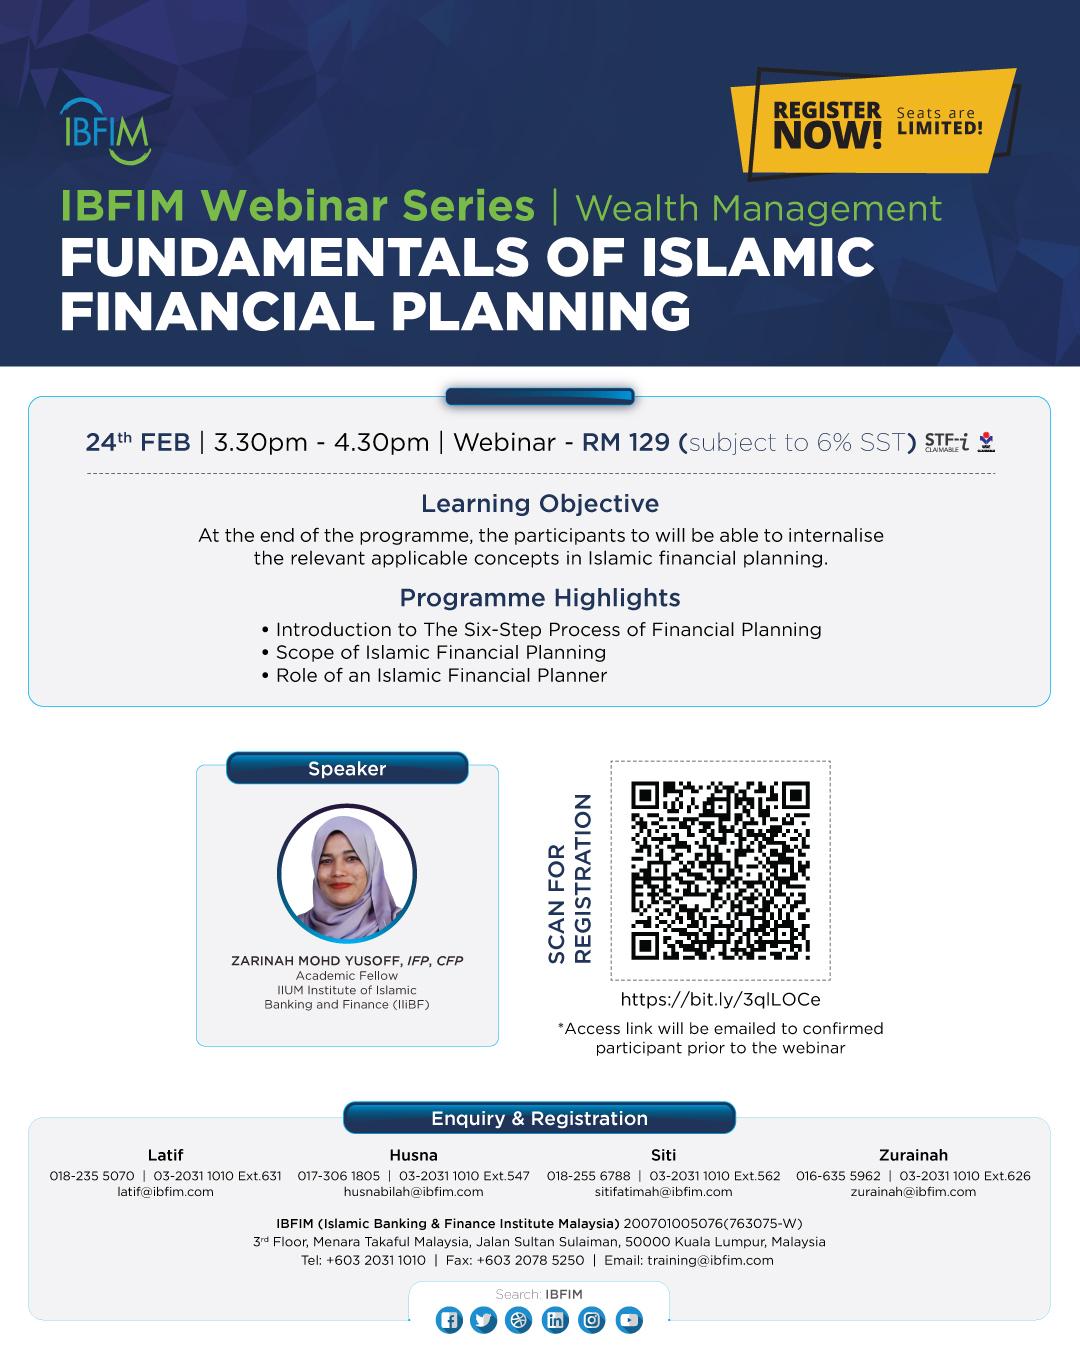 Fundamentals of Islamic Financial Planning